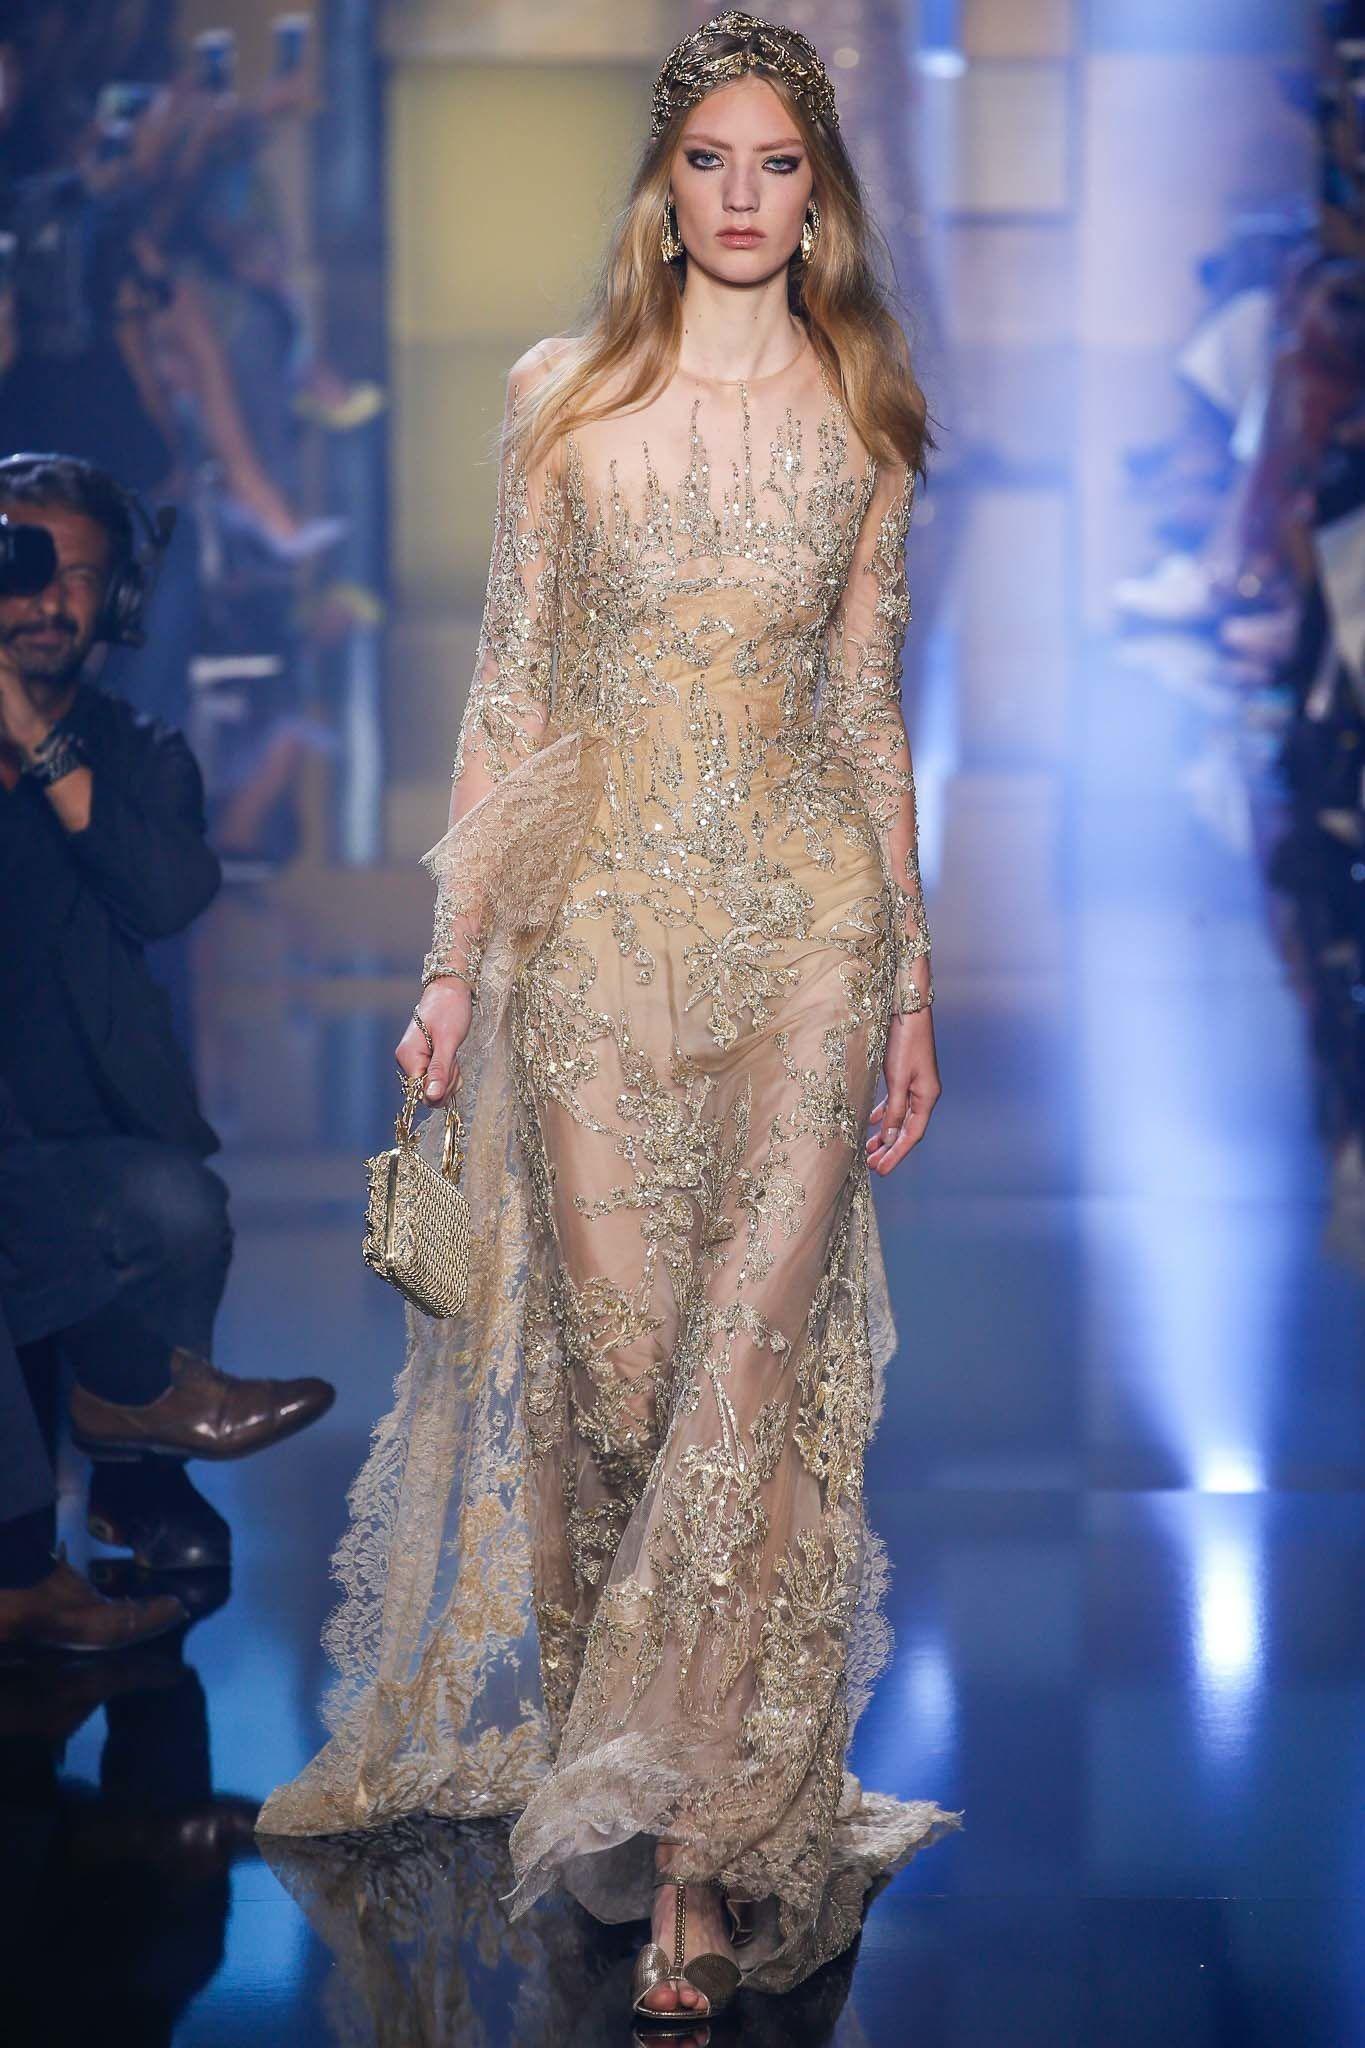 Elie Saab Fall 2015 Couture Fashion Show - Susanne Knipper (Elite)